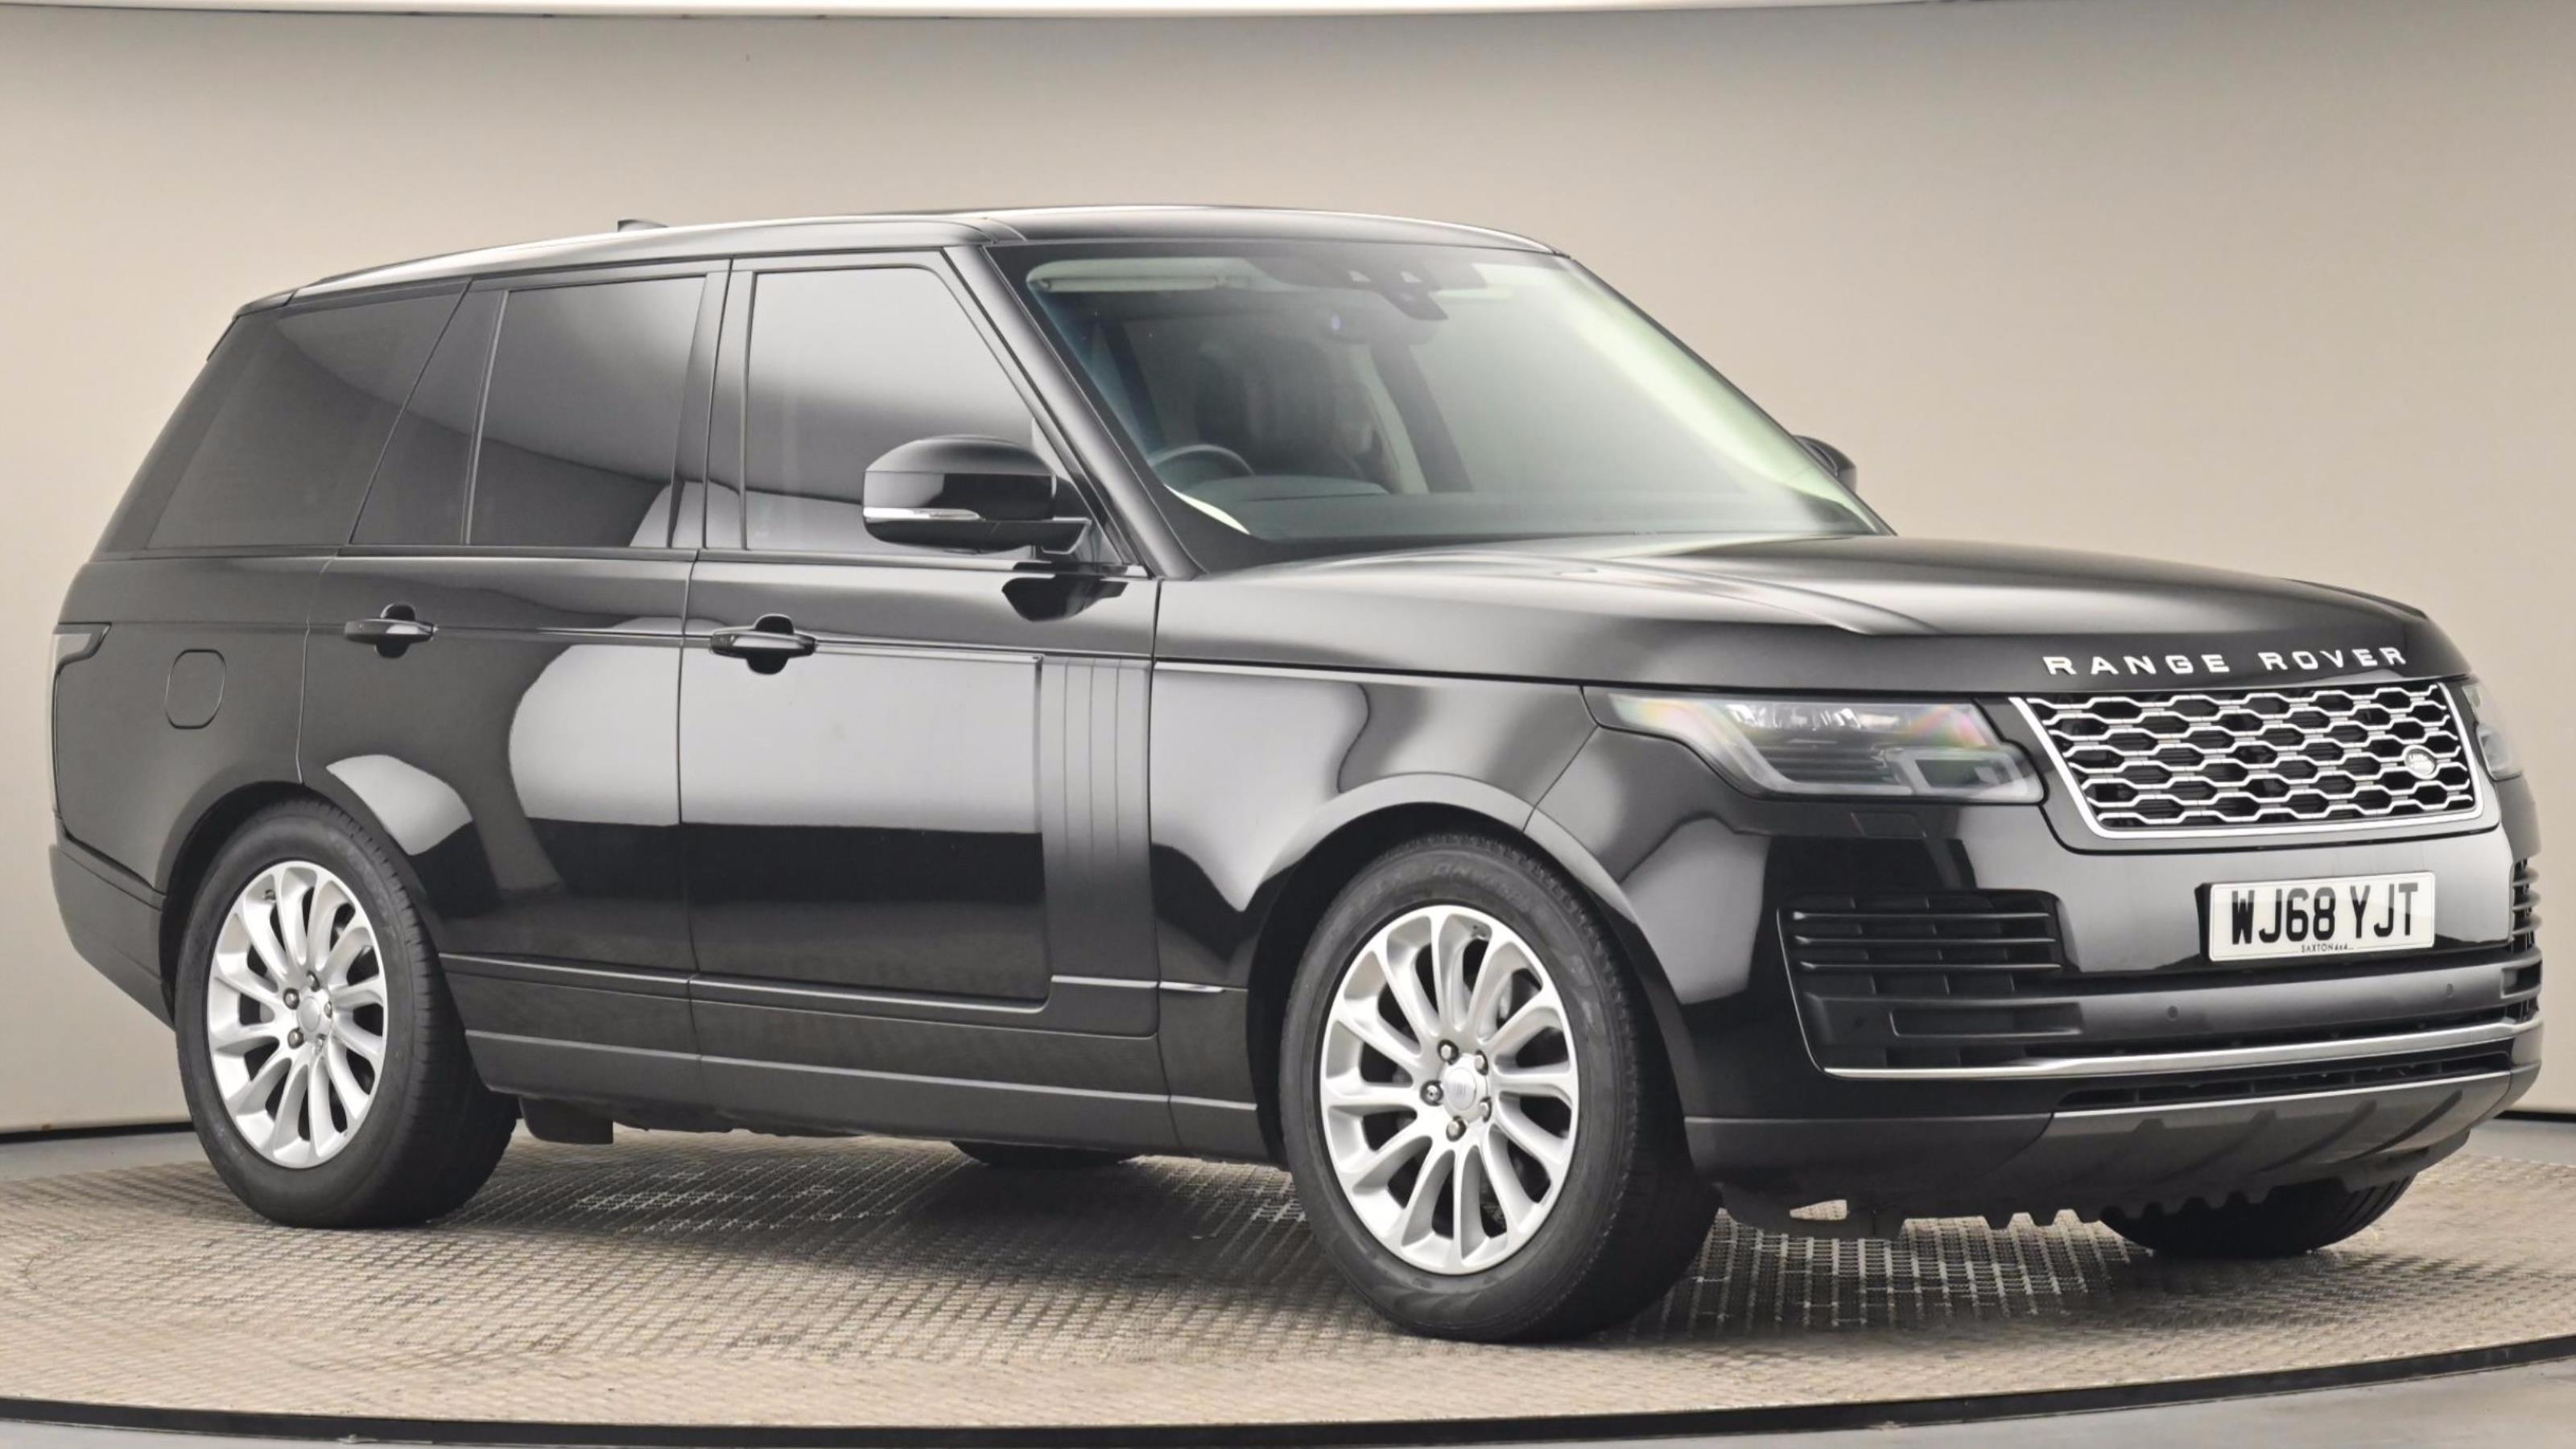 Used 2018 Land Rover RANGE ROVER 3.0 SDV6 Vogue 4dr Auto BLACK at Saxton4x4